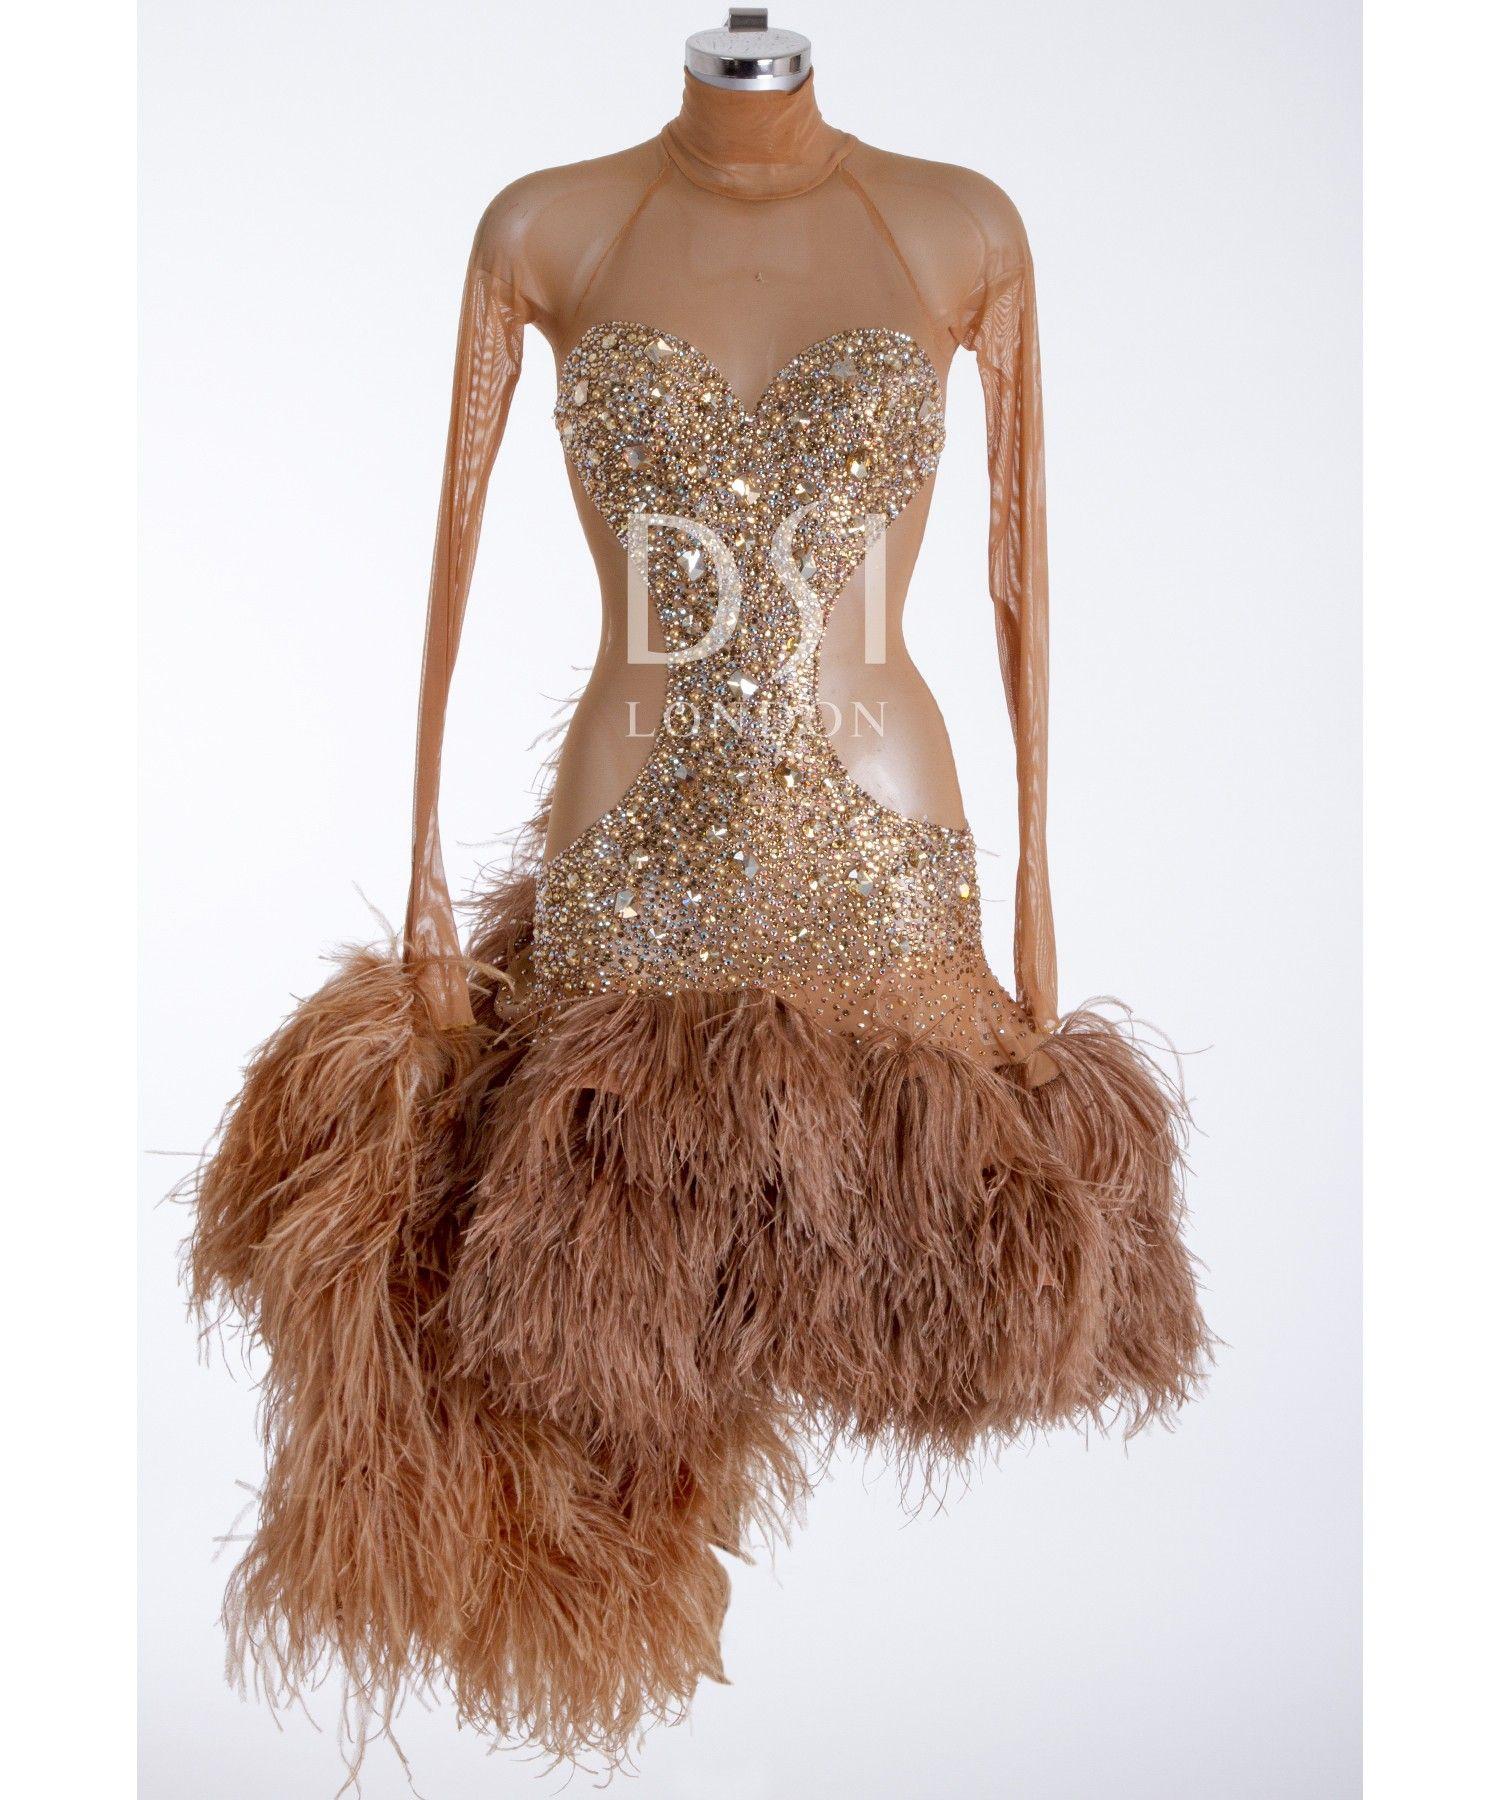 388393 Tan Latin Dress | Latin dresses for sale | Dance ...